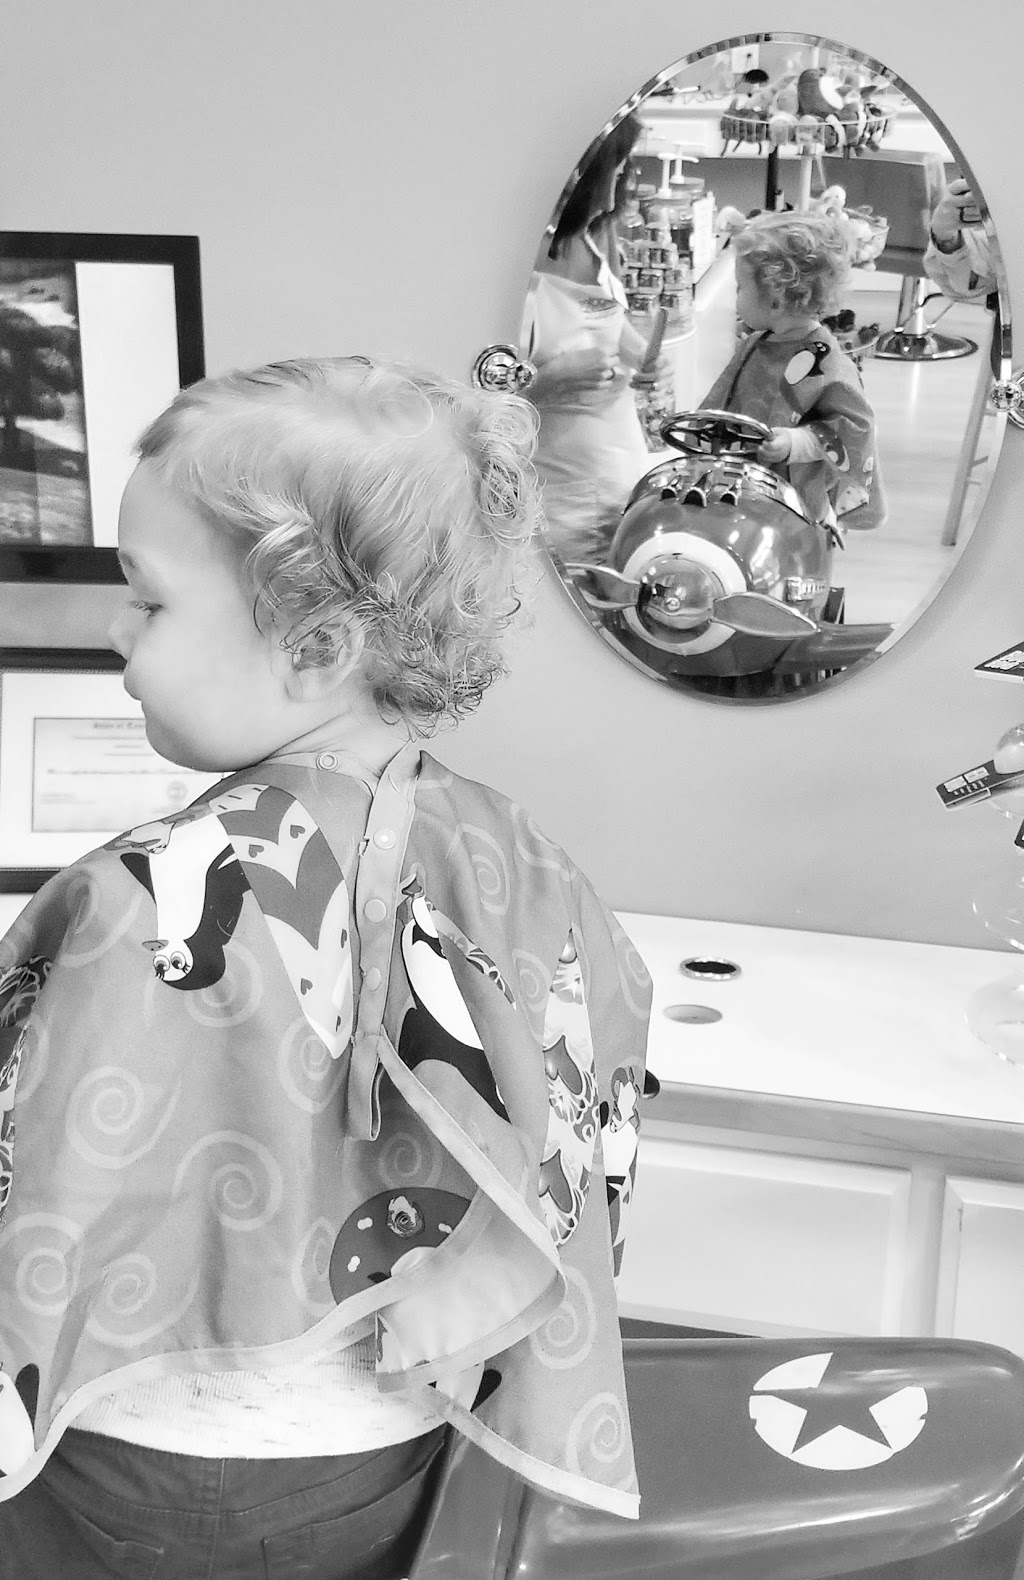 Giggles & Glam Salon - hair care  | Photo 9 of 10 | Address: D, 300 Indian Lake Blvd #200, Hendersonville, TN 37075, USA | Phone: (615) 989-1335